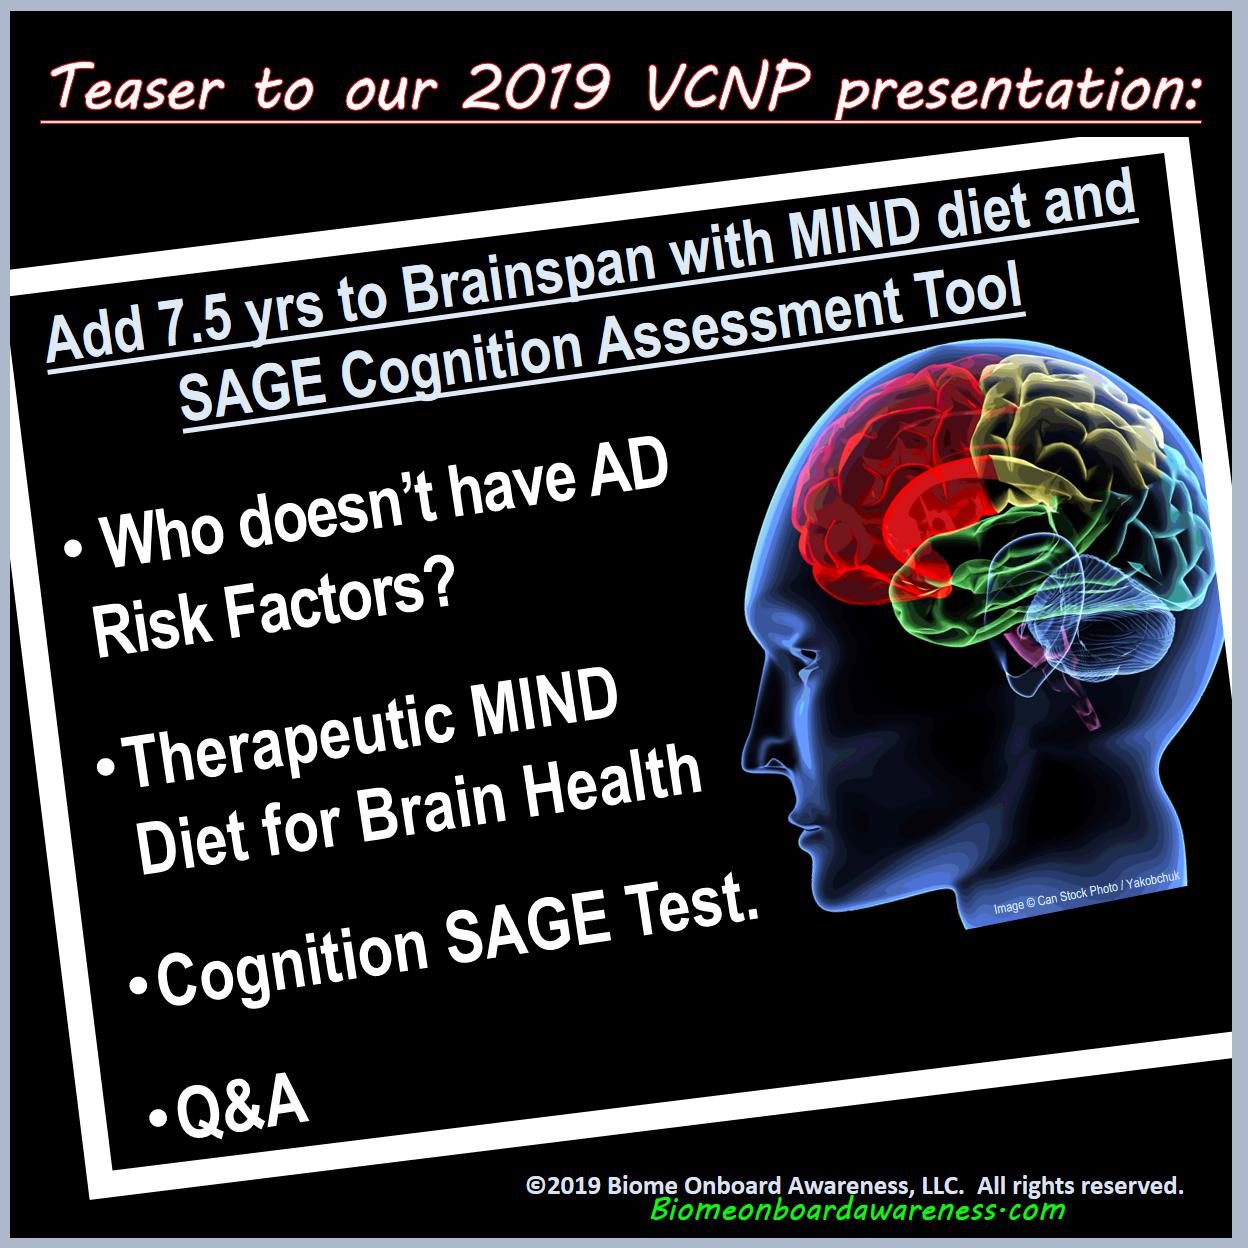 Prelude PDF of the MIND diet CME. 9 slides depicting